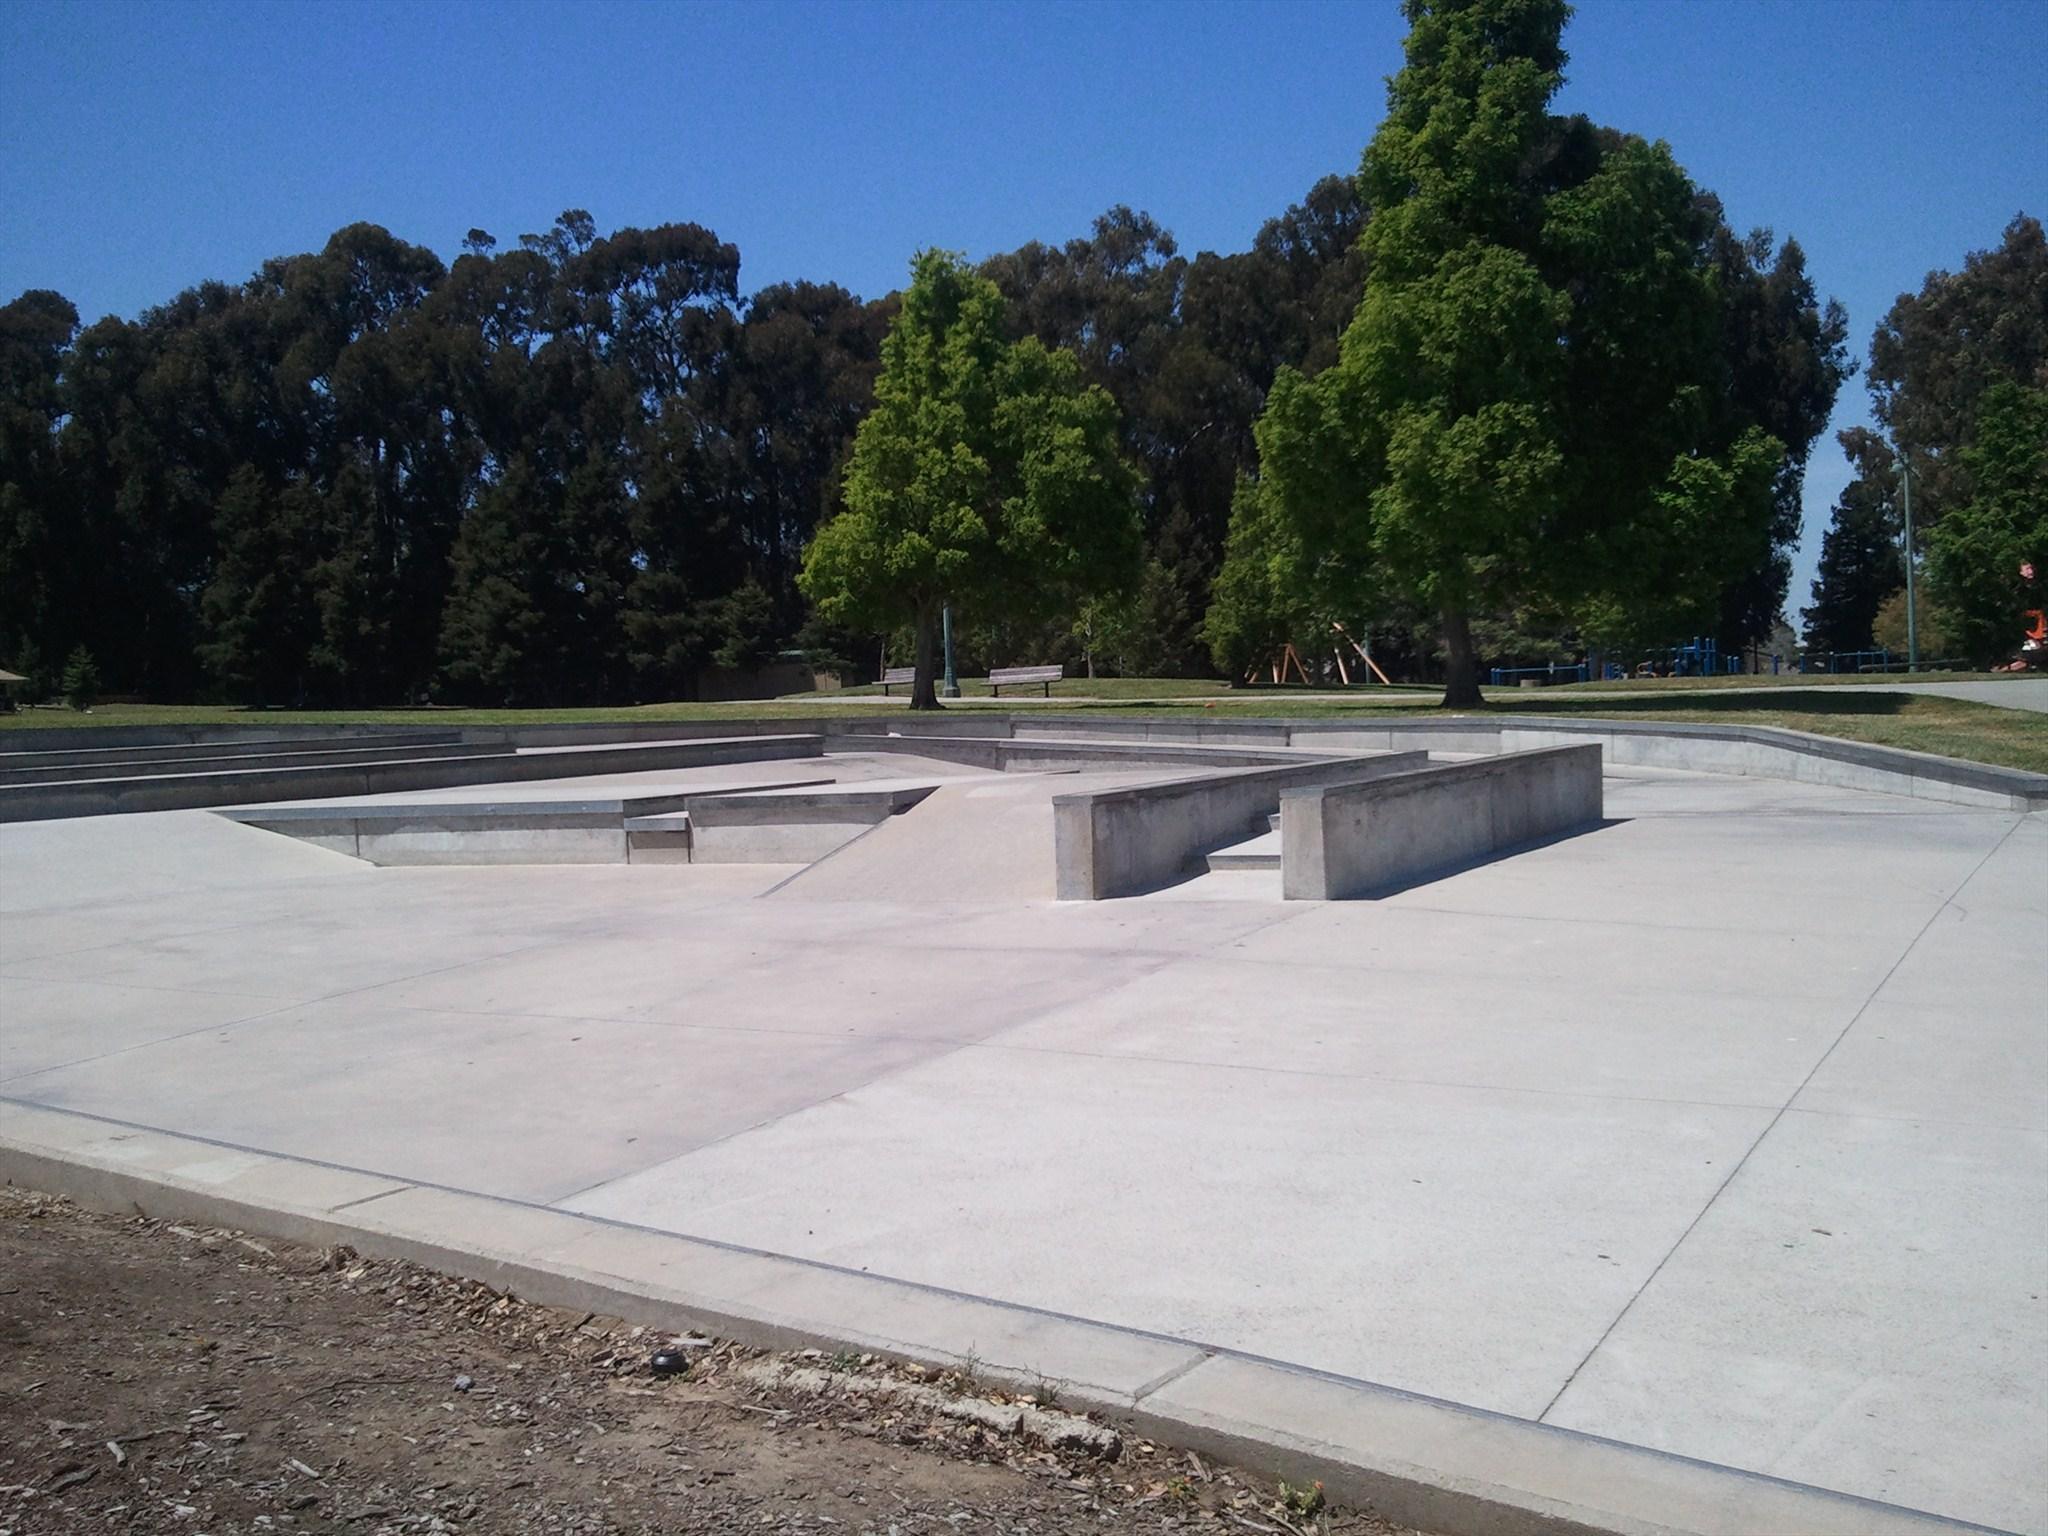 beresford skatepark, san mateo, california